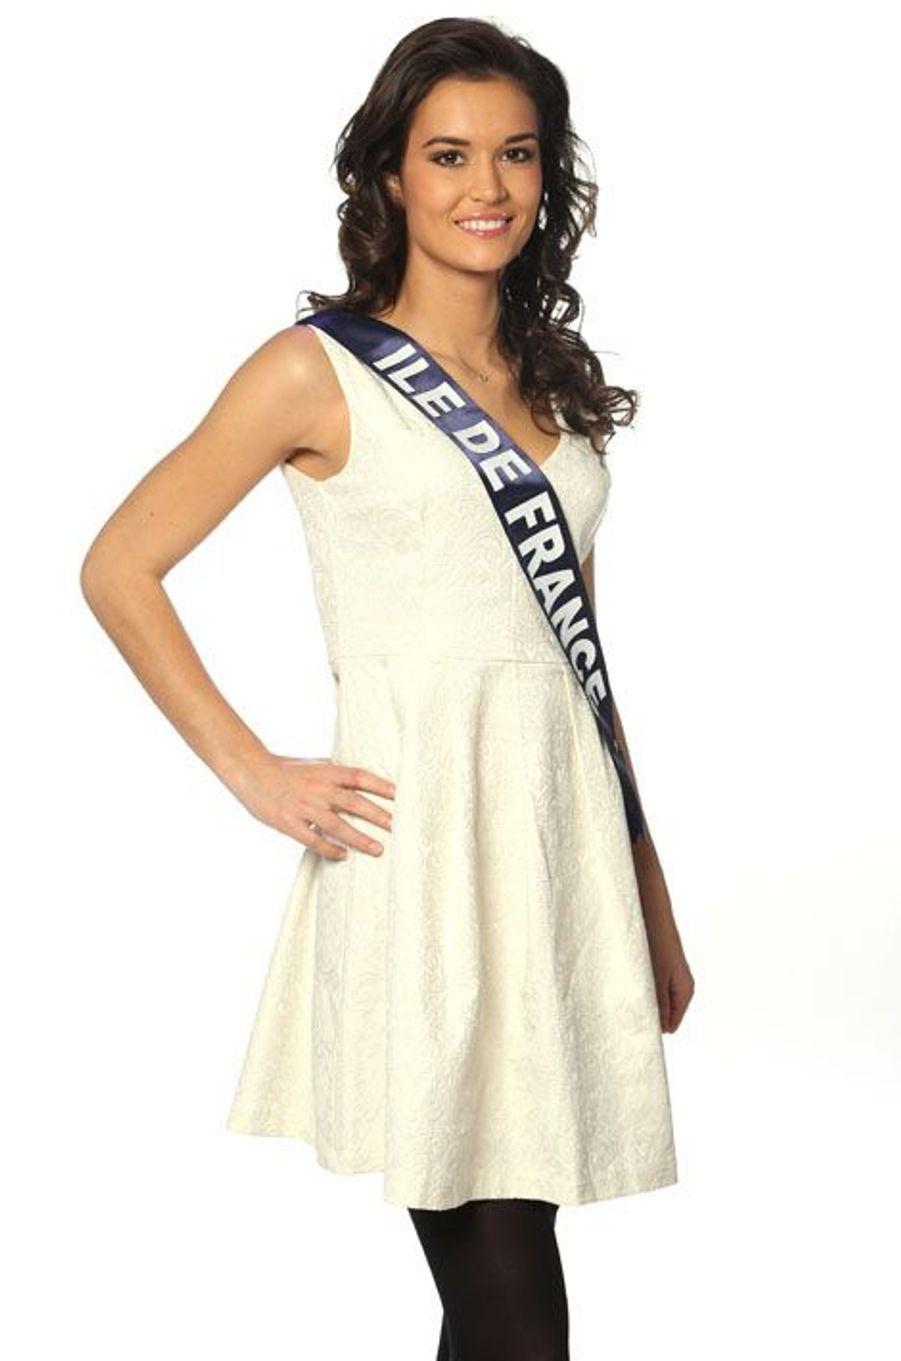 Leaticia Vuillemard, 20 ans, Miss Ile de France